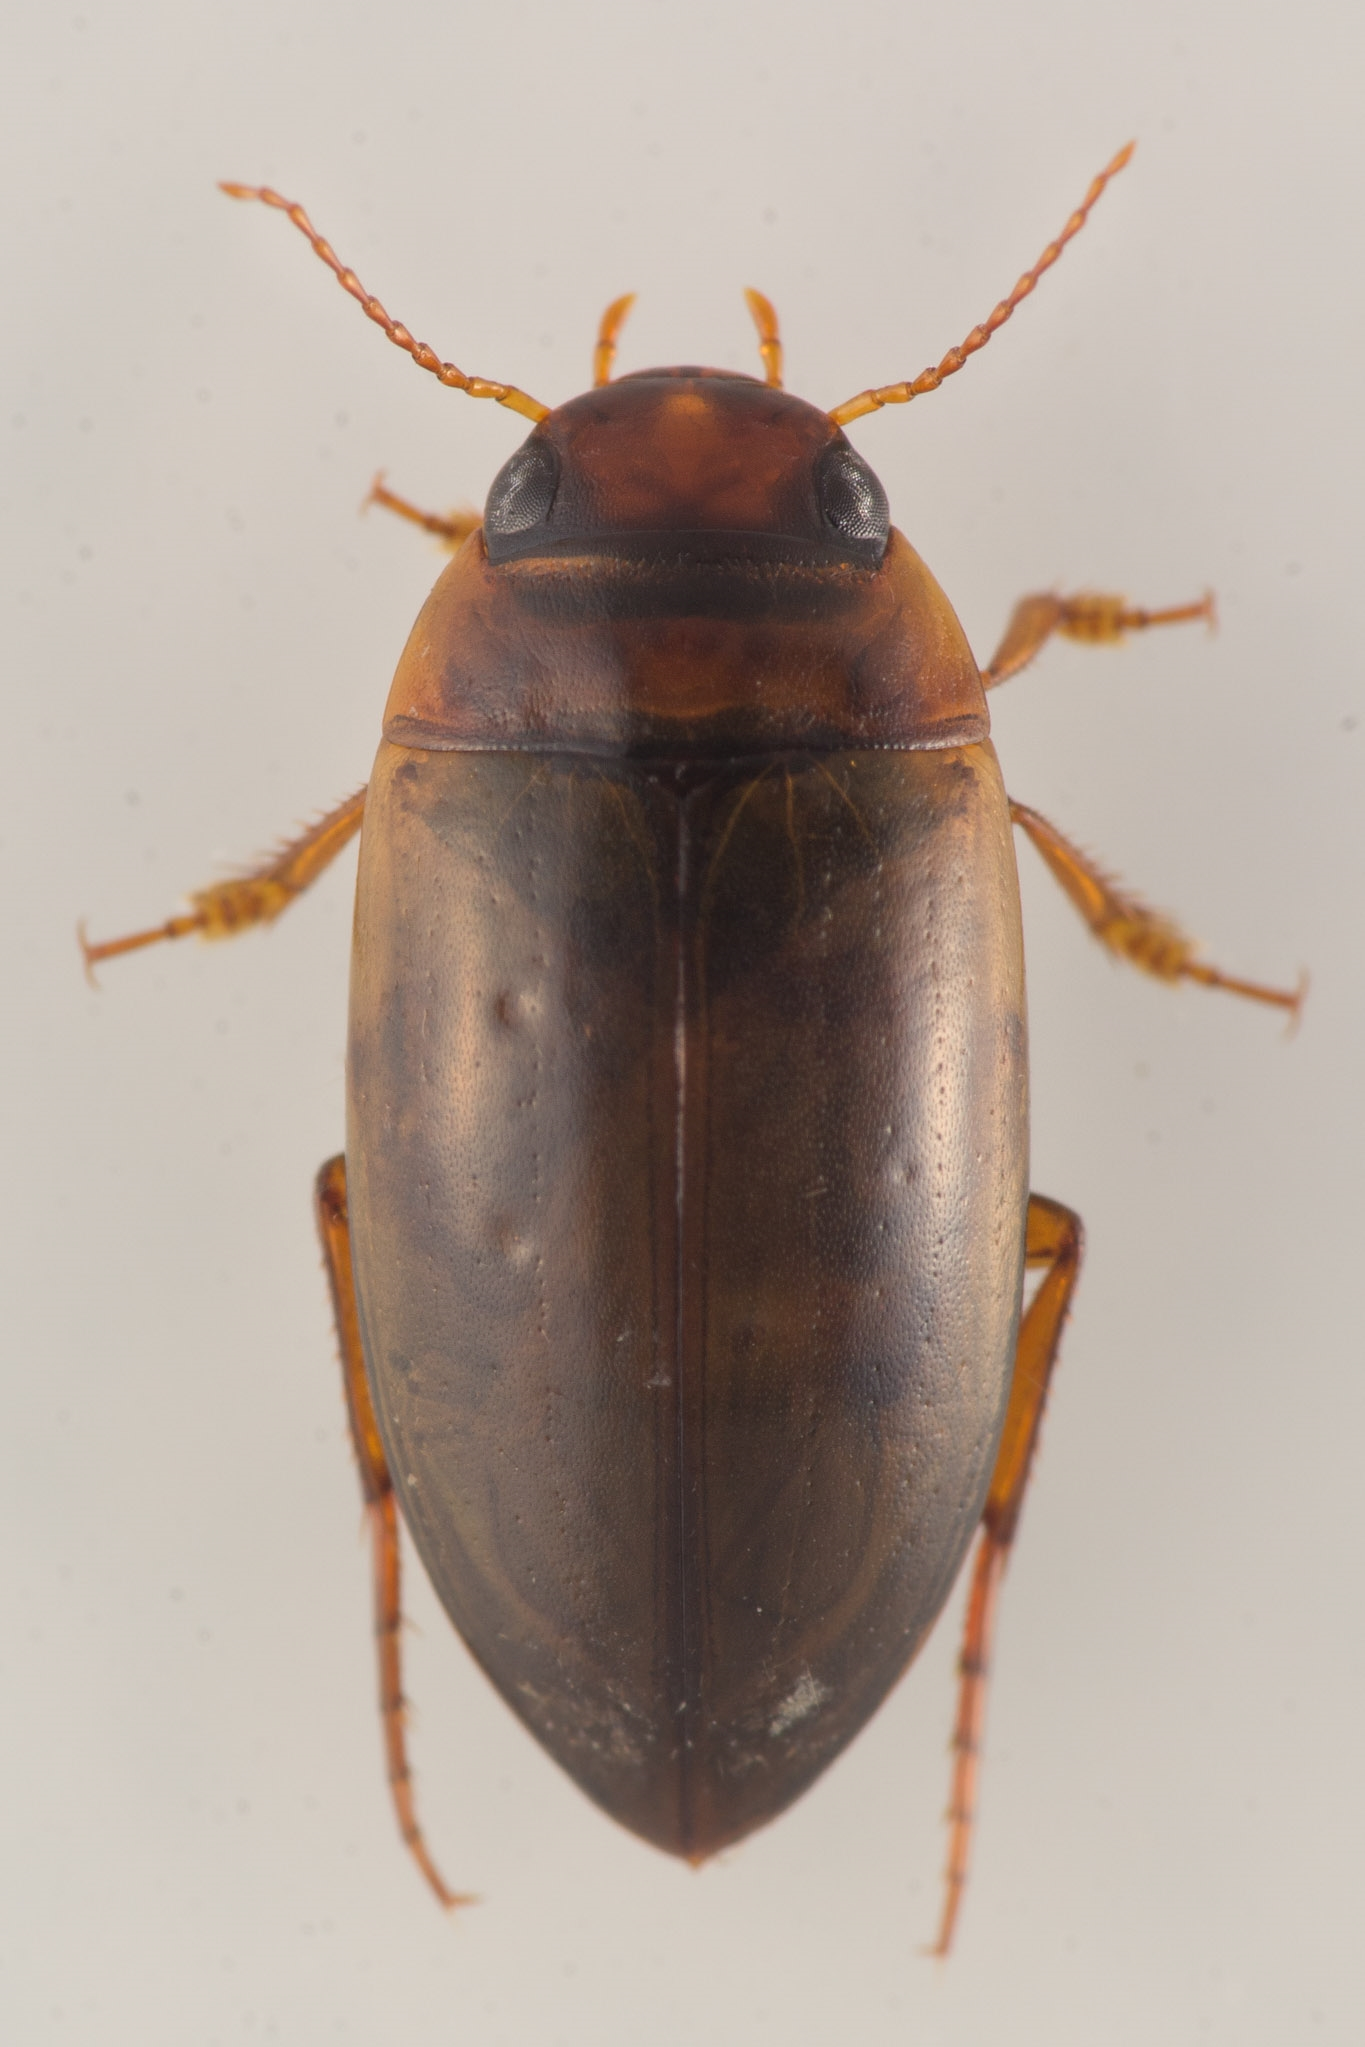 Liopterus haemorrhoidalis (Liopterus haemorrhoidalis)